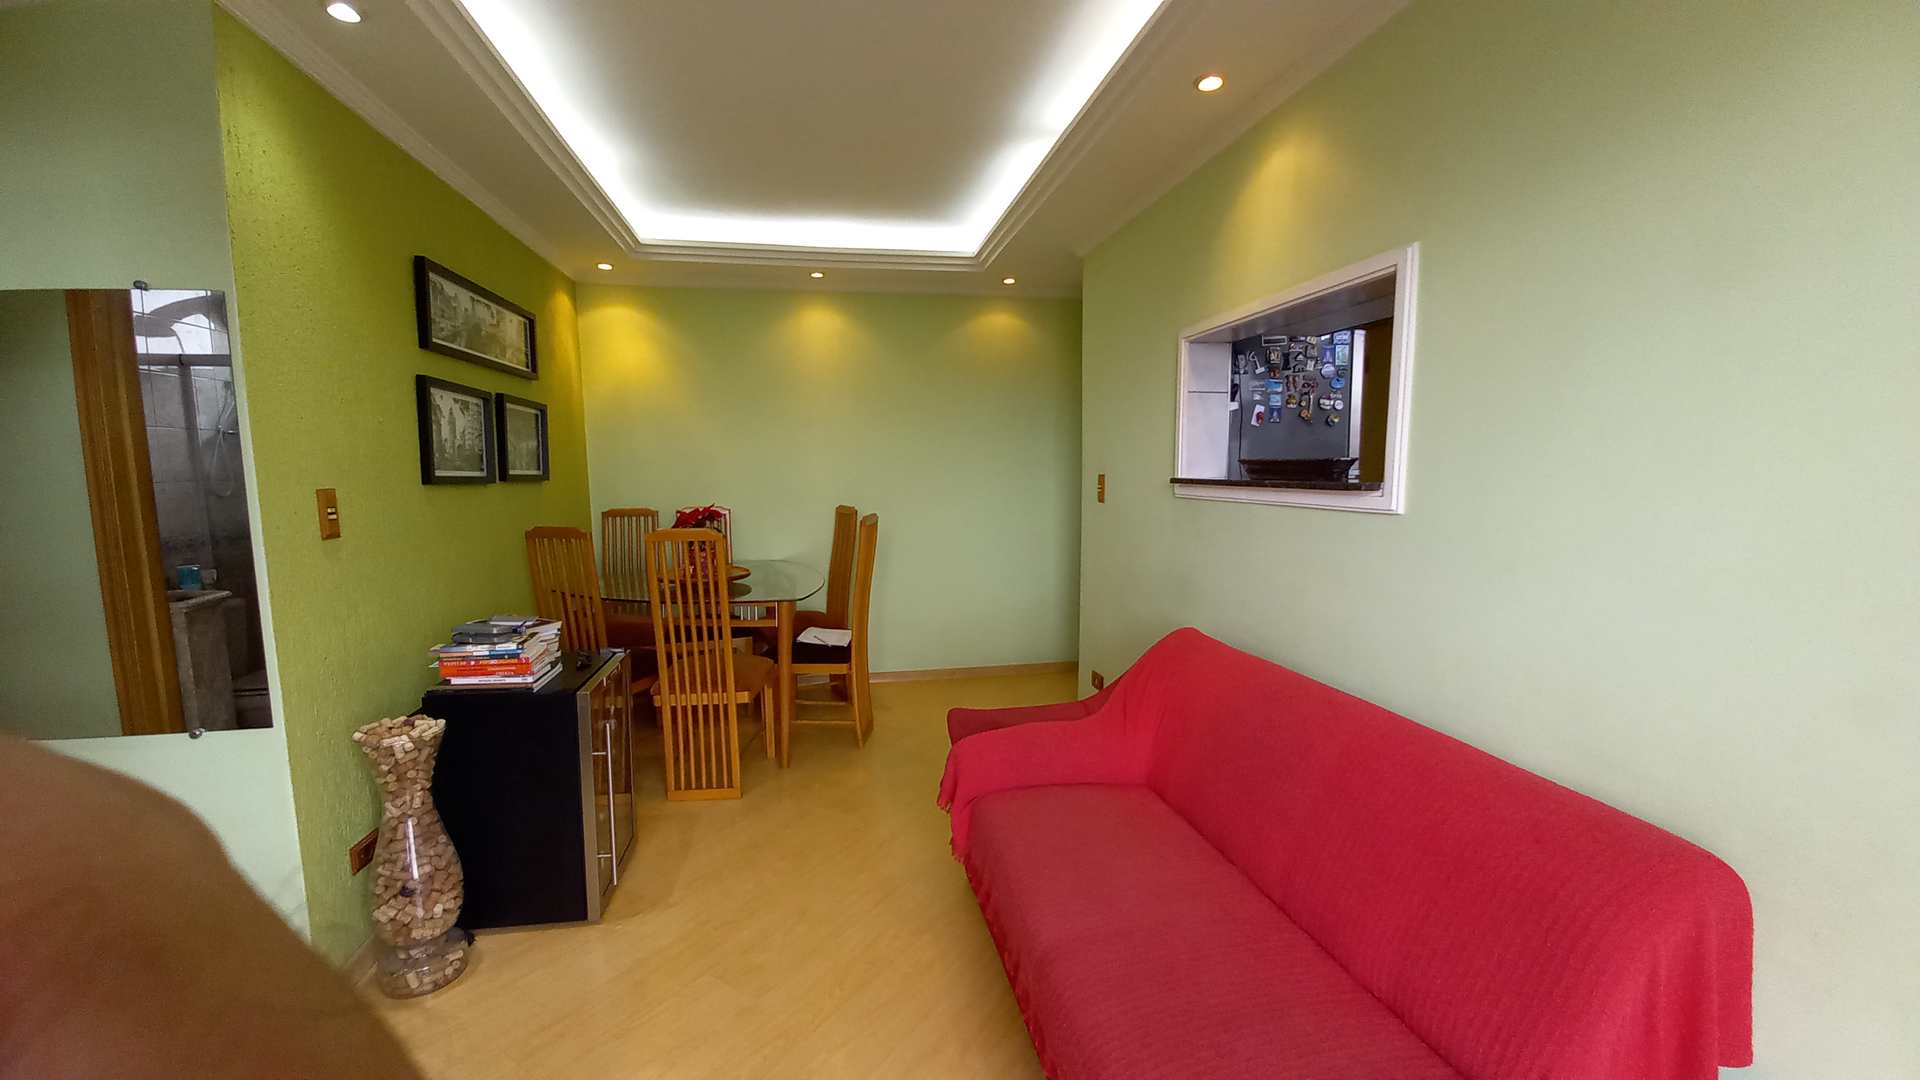 Apartamento com 2 dorms, Vila Urupês, Suzano - R$ 175 mil, Cod: 1239